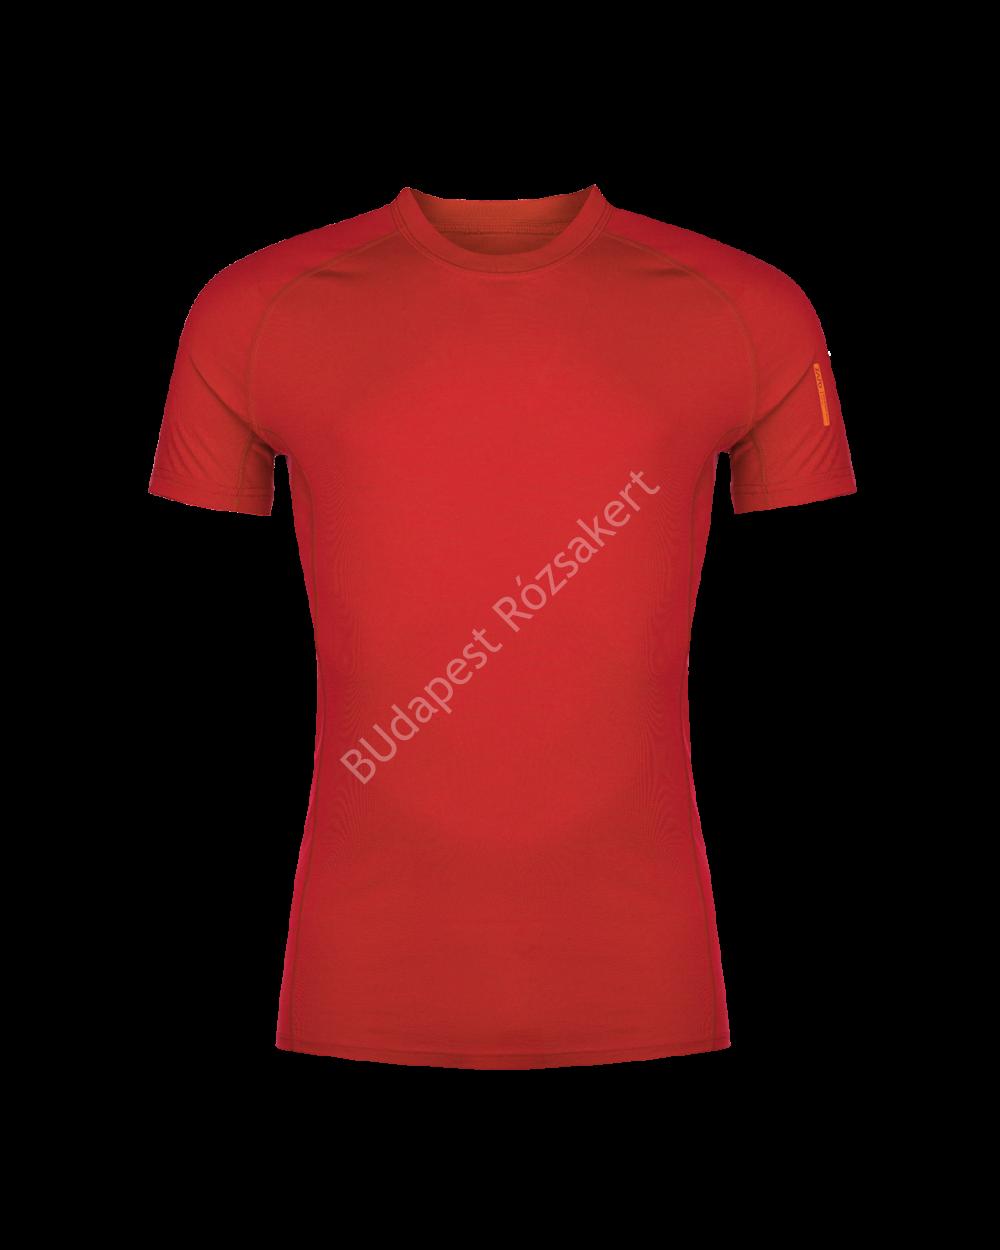 Zajo Bjorn Merino Tshirt SS férfi merinói gyapjú aláöltözet felső, piros